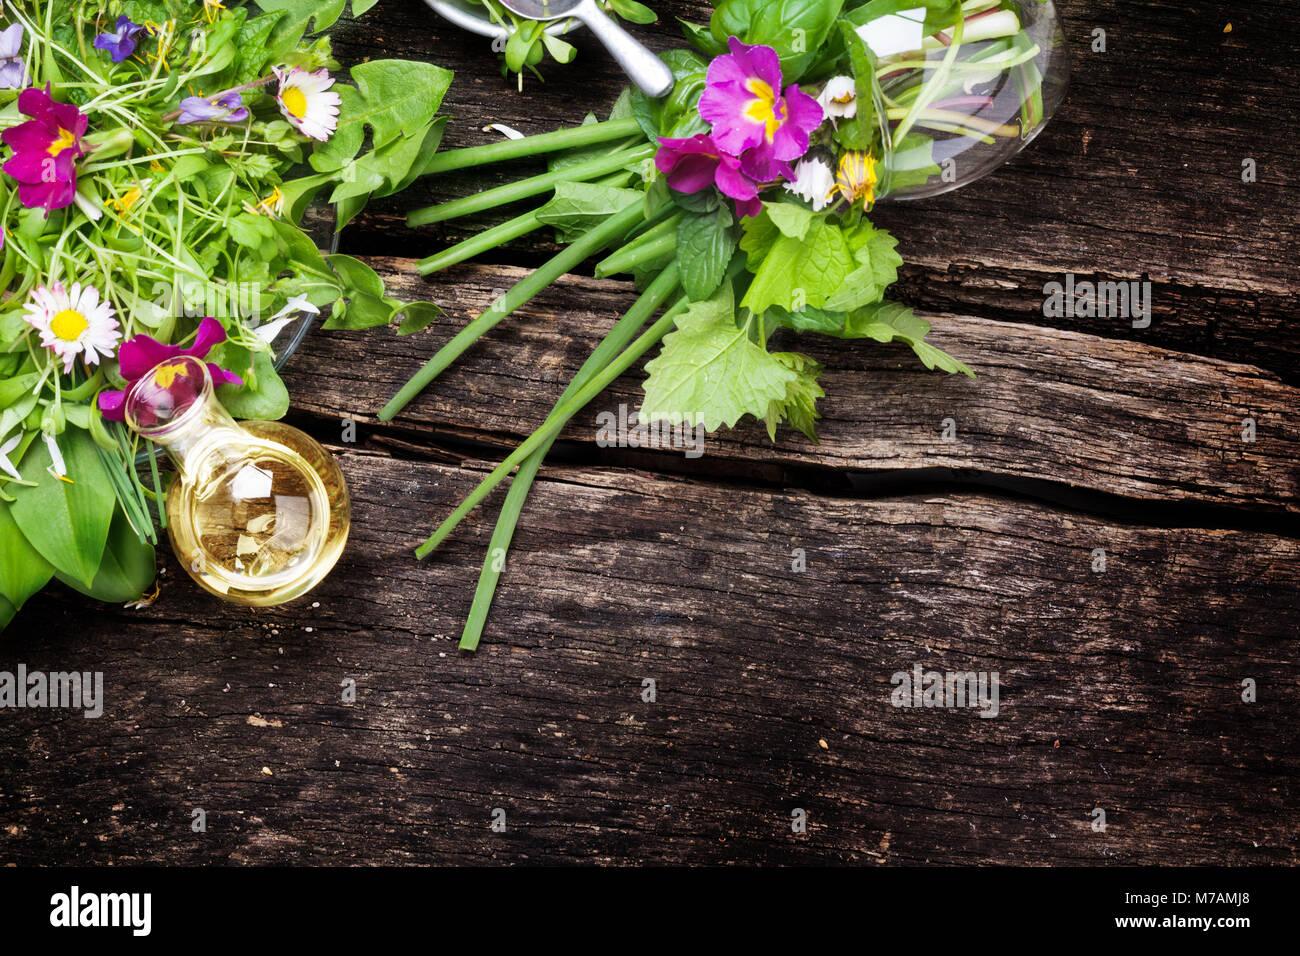 Spring salad edible wild herbs flowers stock photo 176641984 alamy spring salad edible wild herbs flowers mightylinksfo